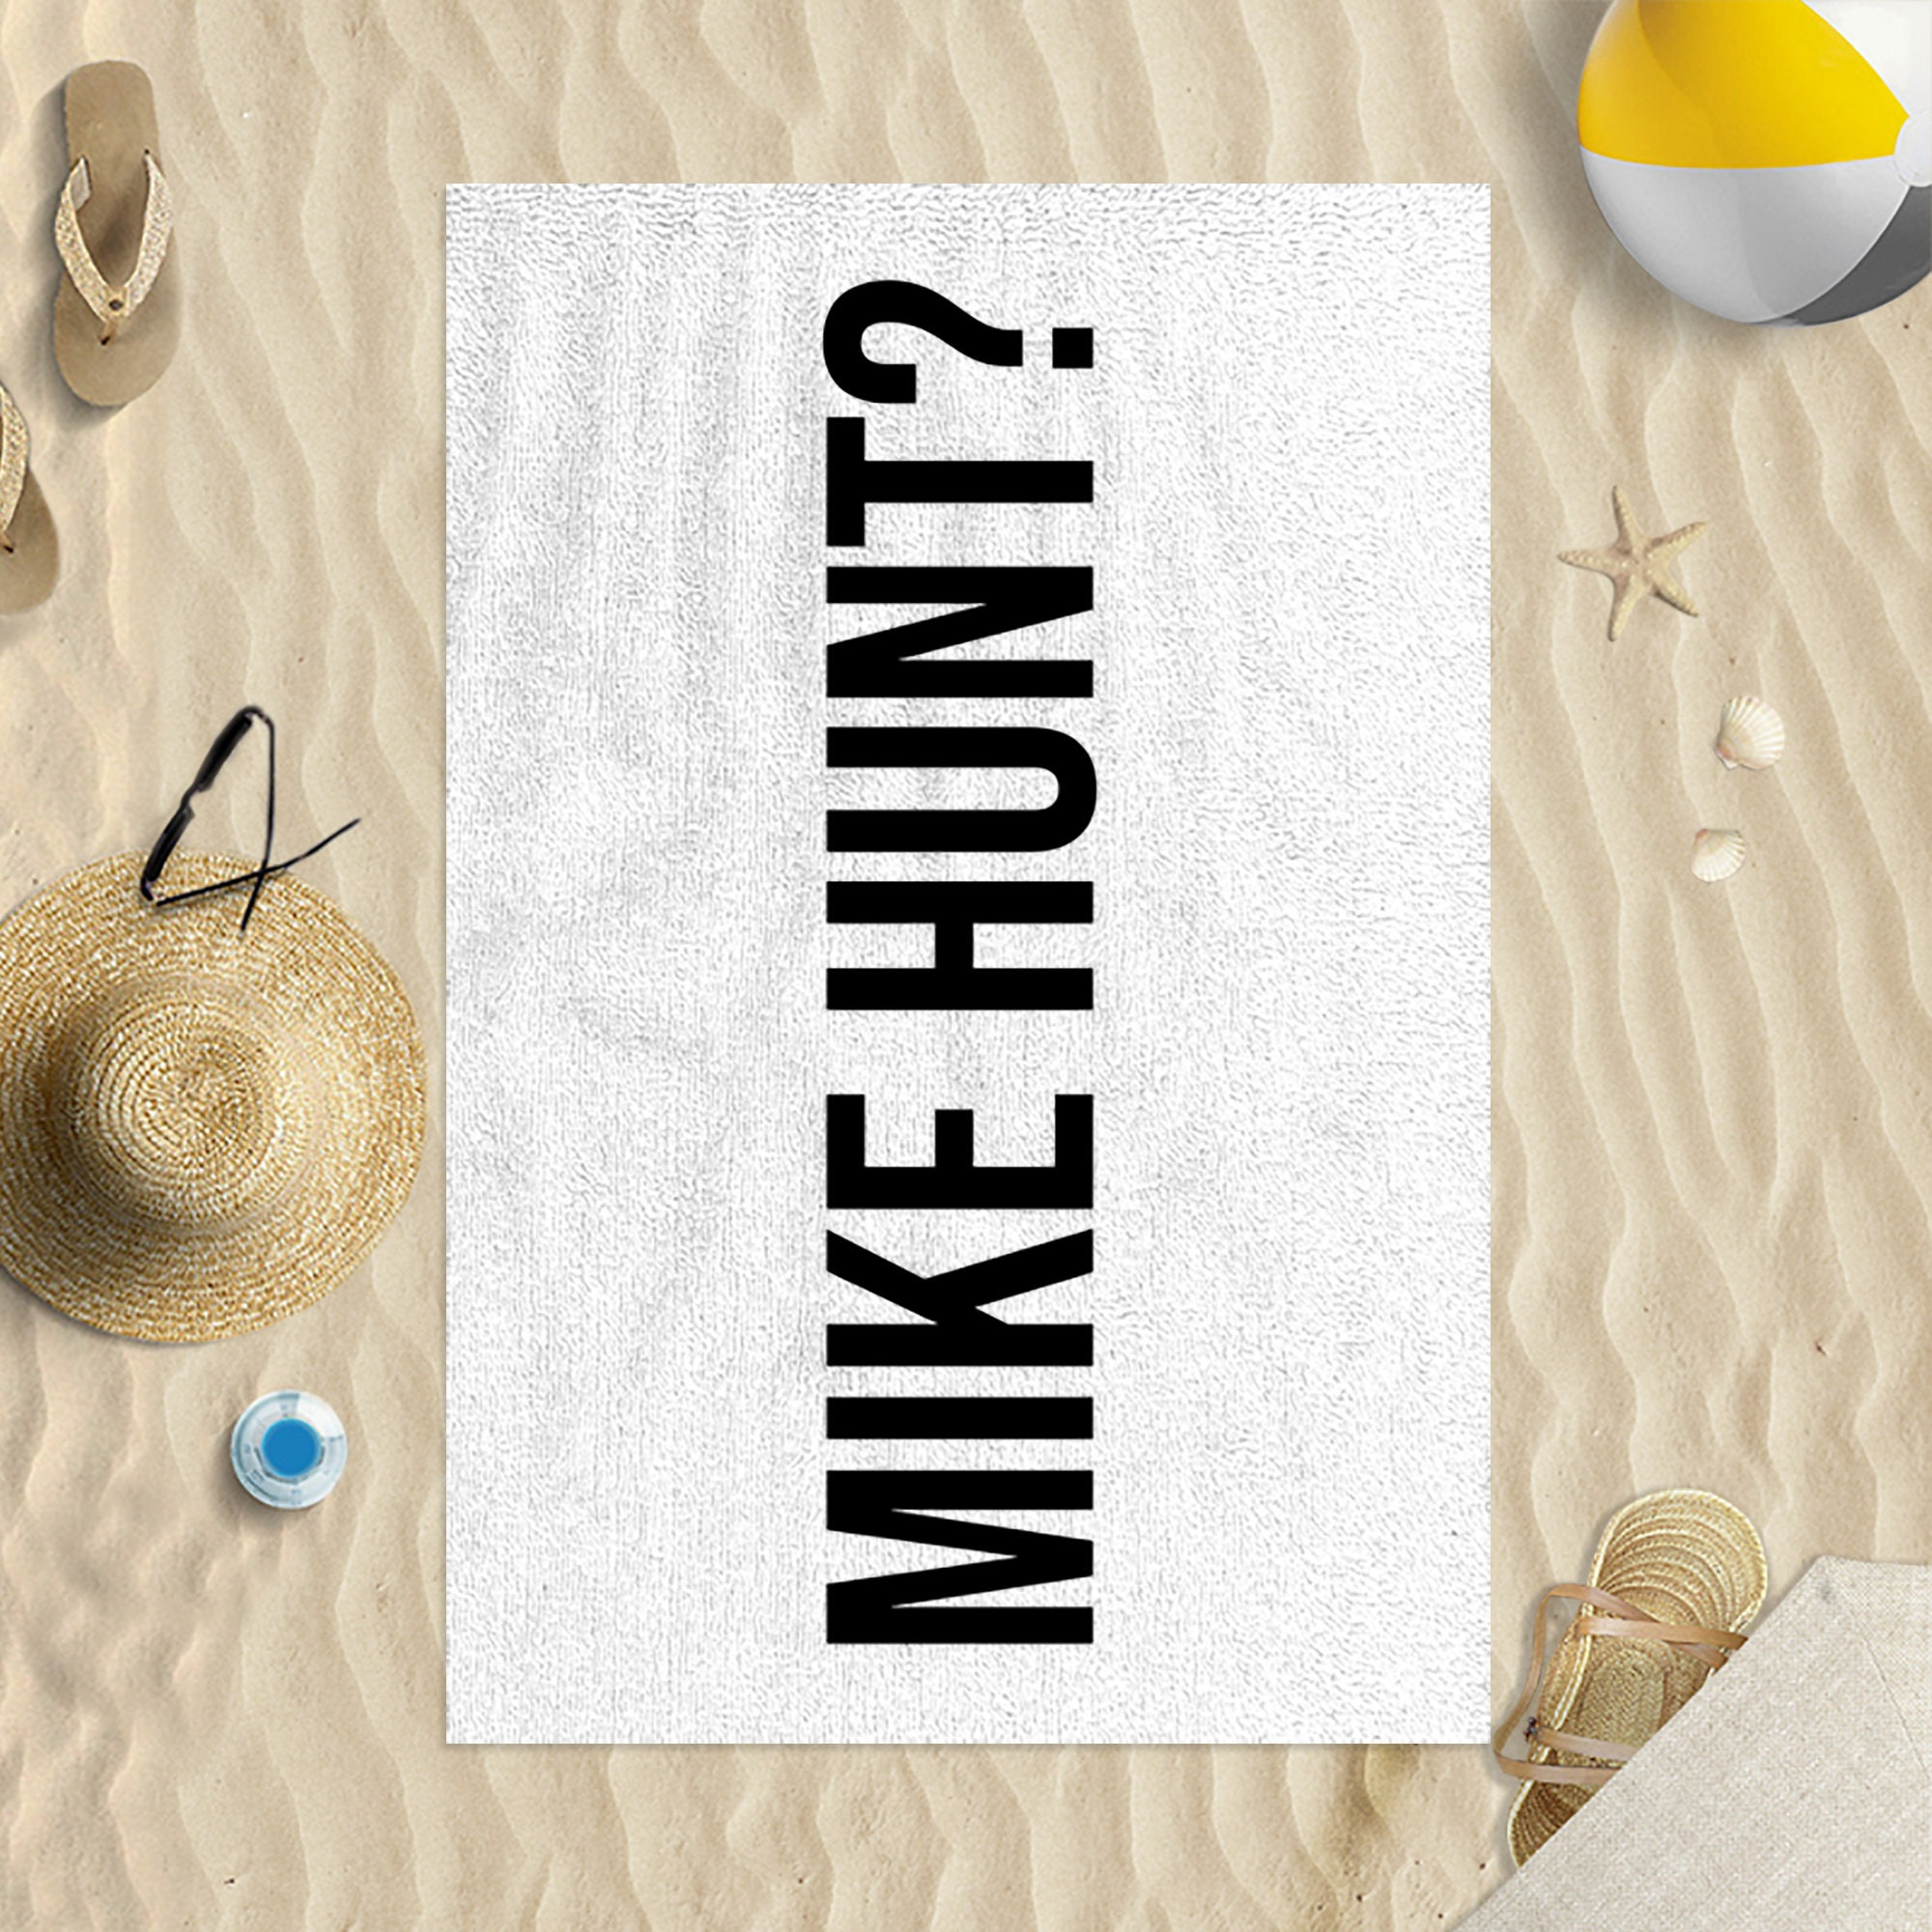 Dig Bick Microfibre Beach Towel Black /& White Print Funny Joke Gift Beach